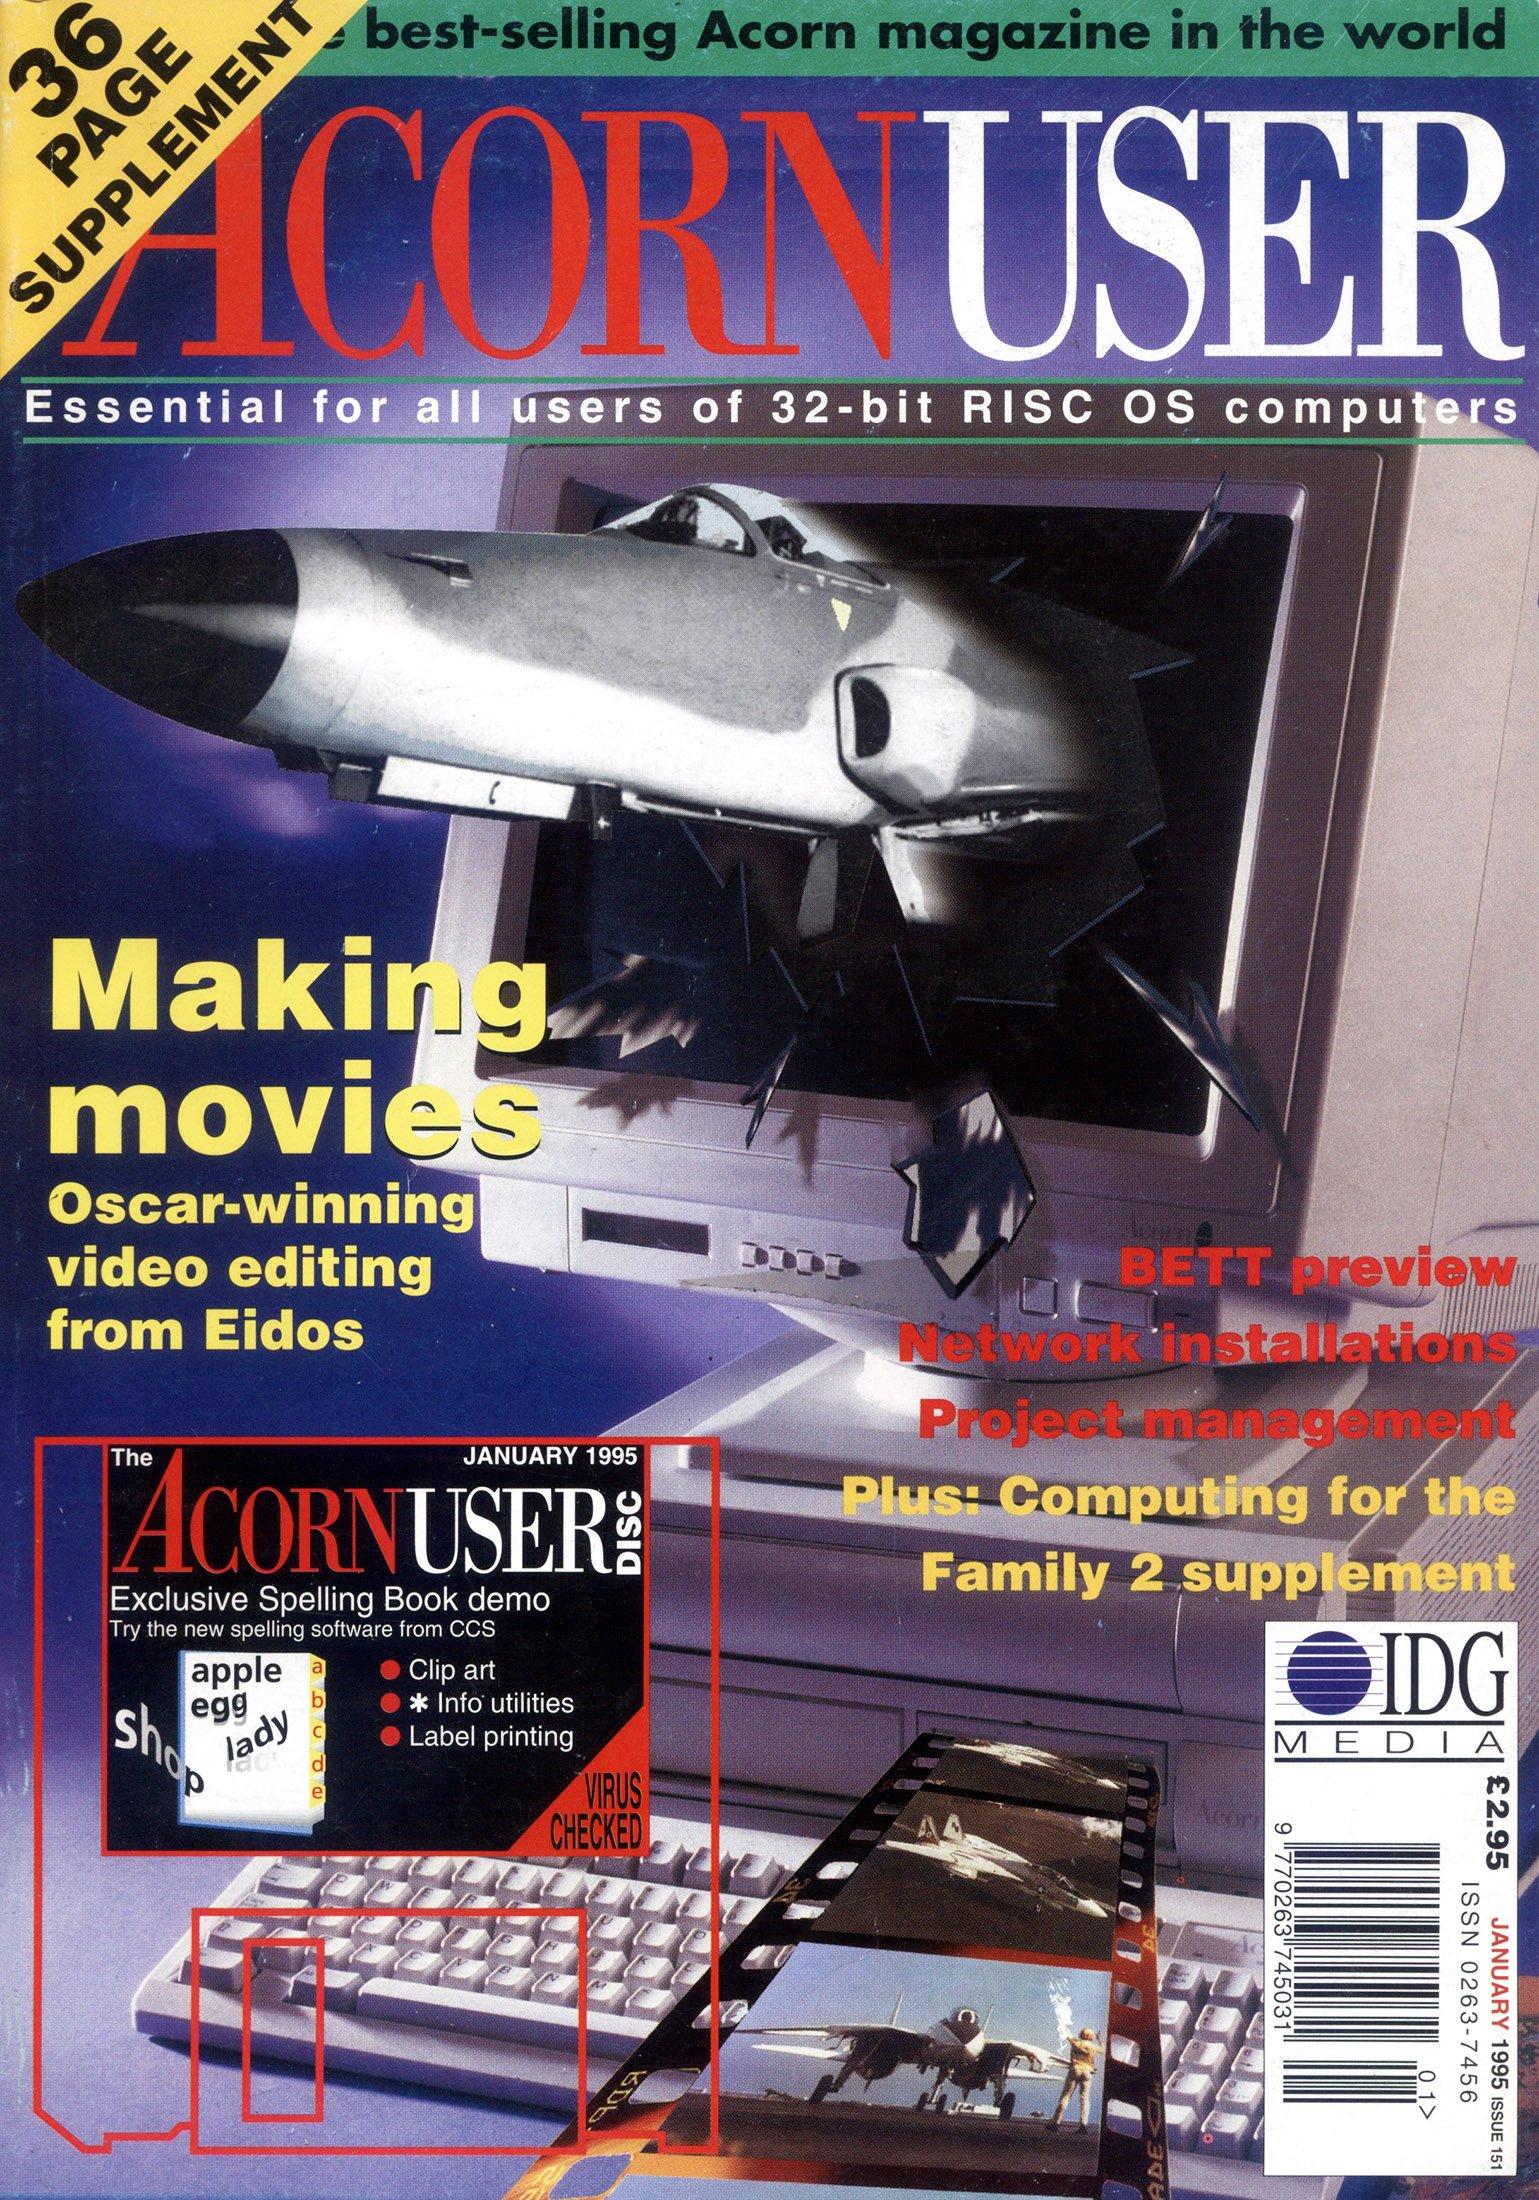 Acorn User 151 (January 1995)